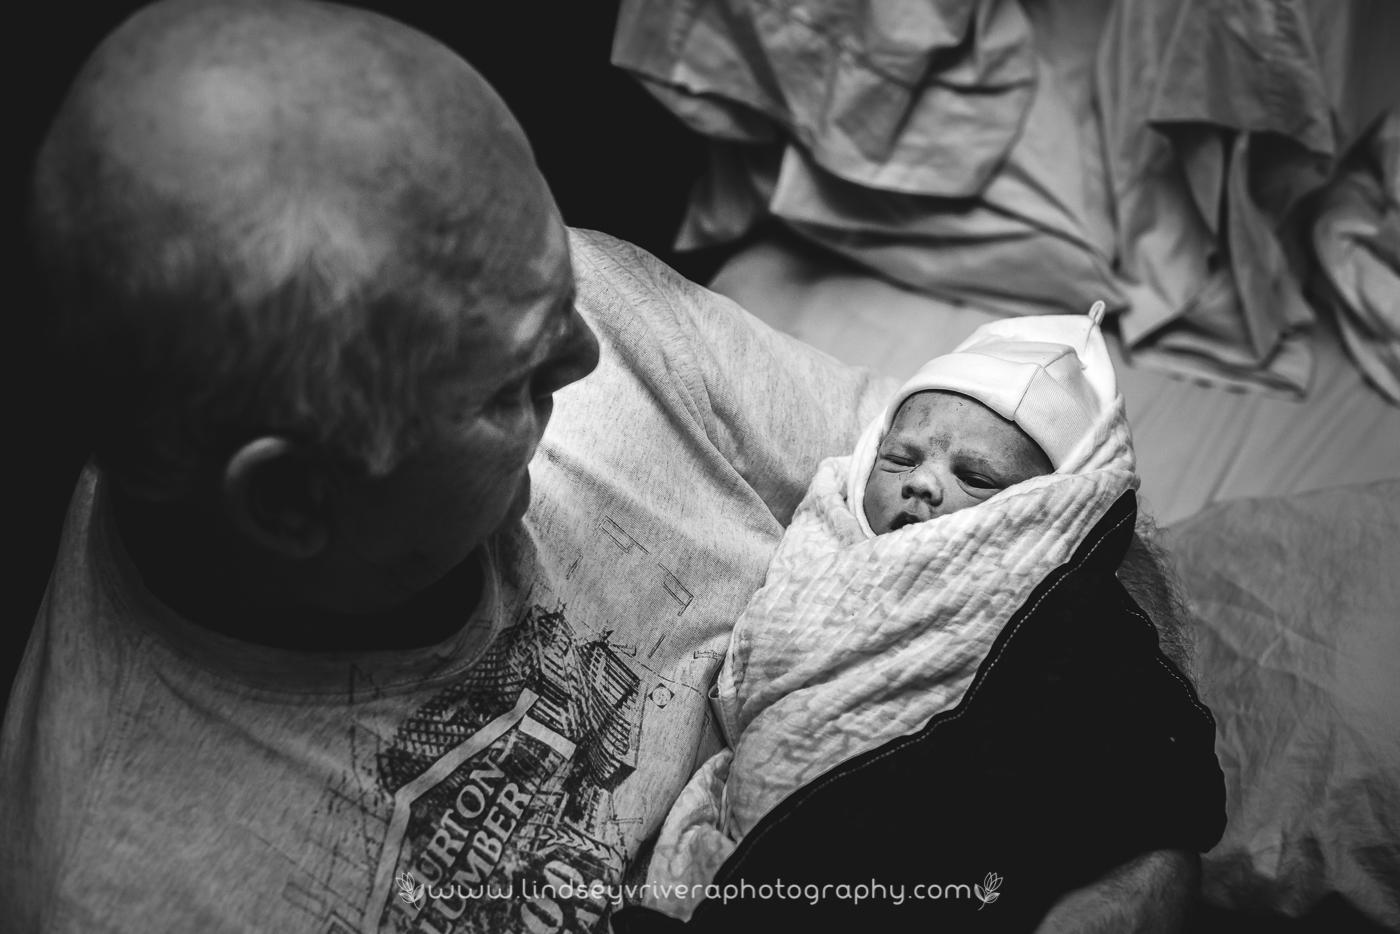 Home-Birth-Born-Photography-Salt-Lake-City,-Wasatch-Midwifery-&-Wellness,-Just-Born71.jpg